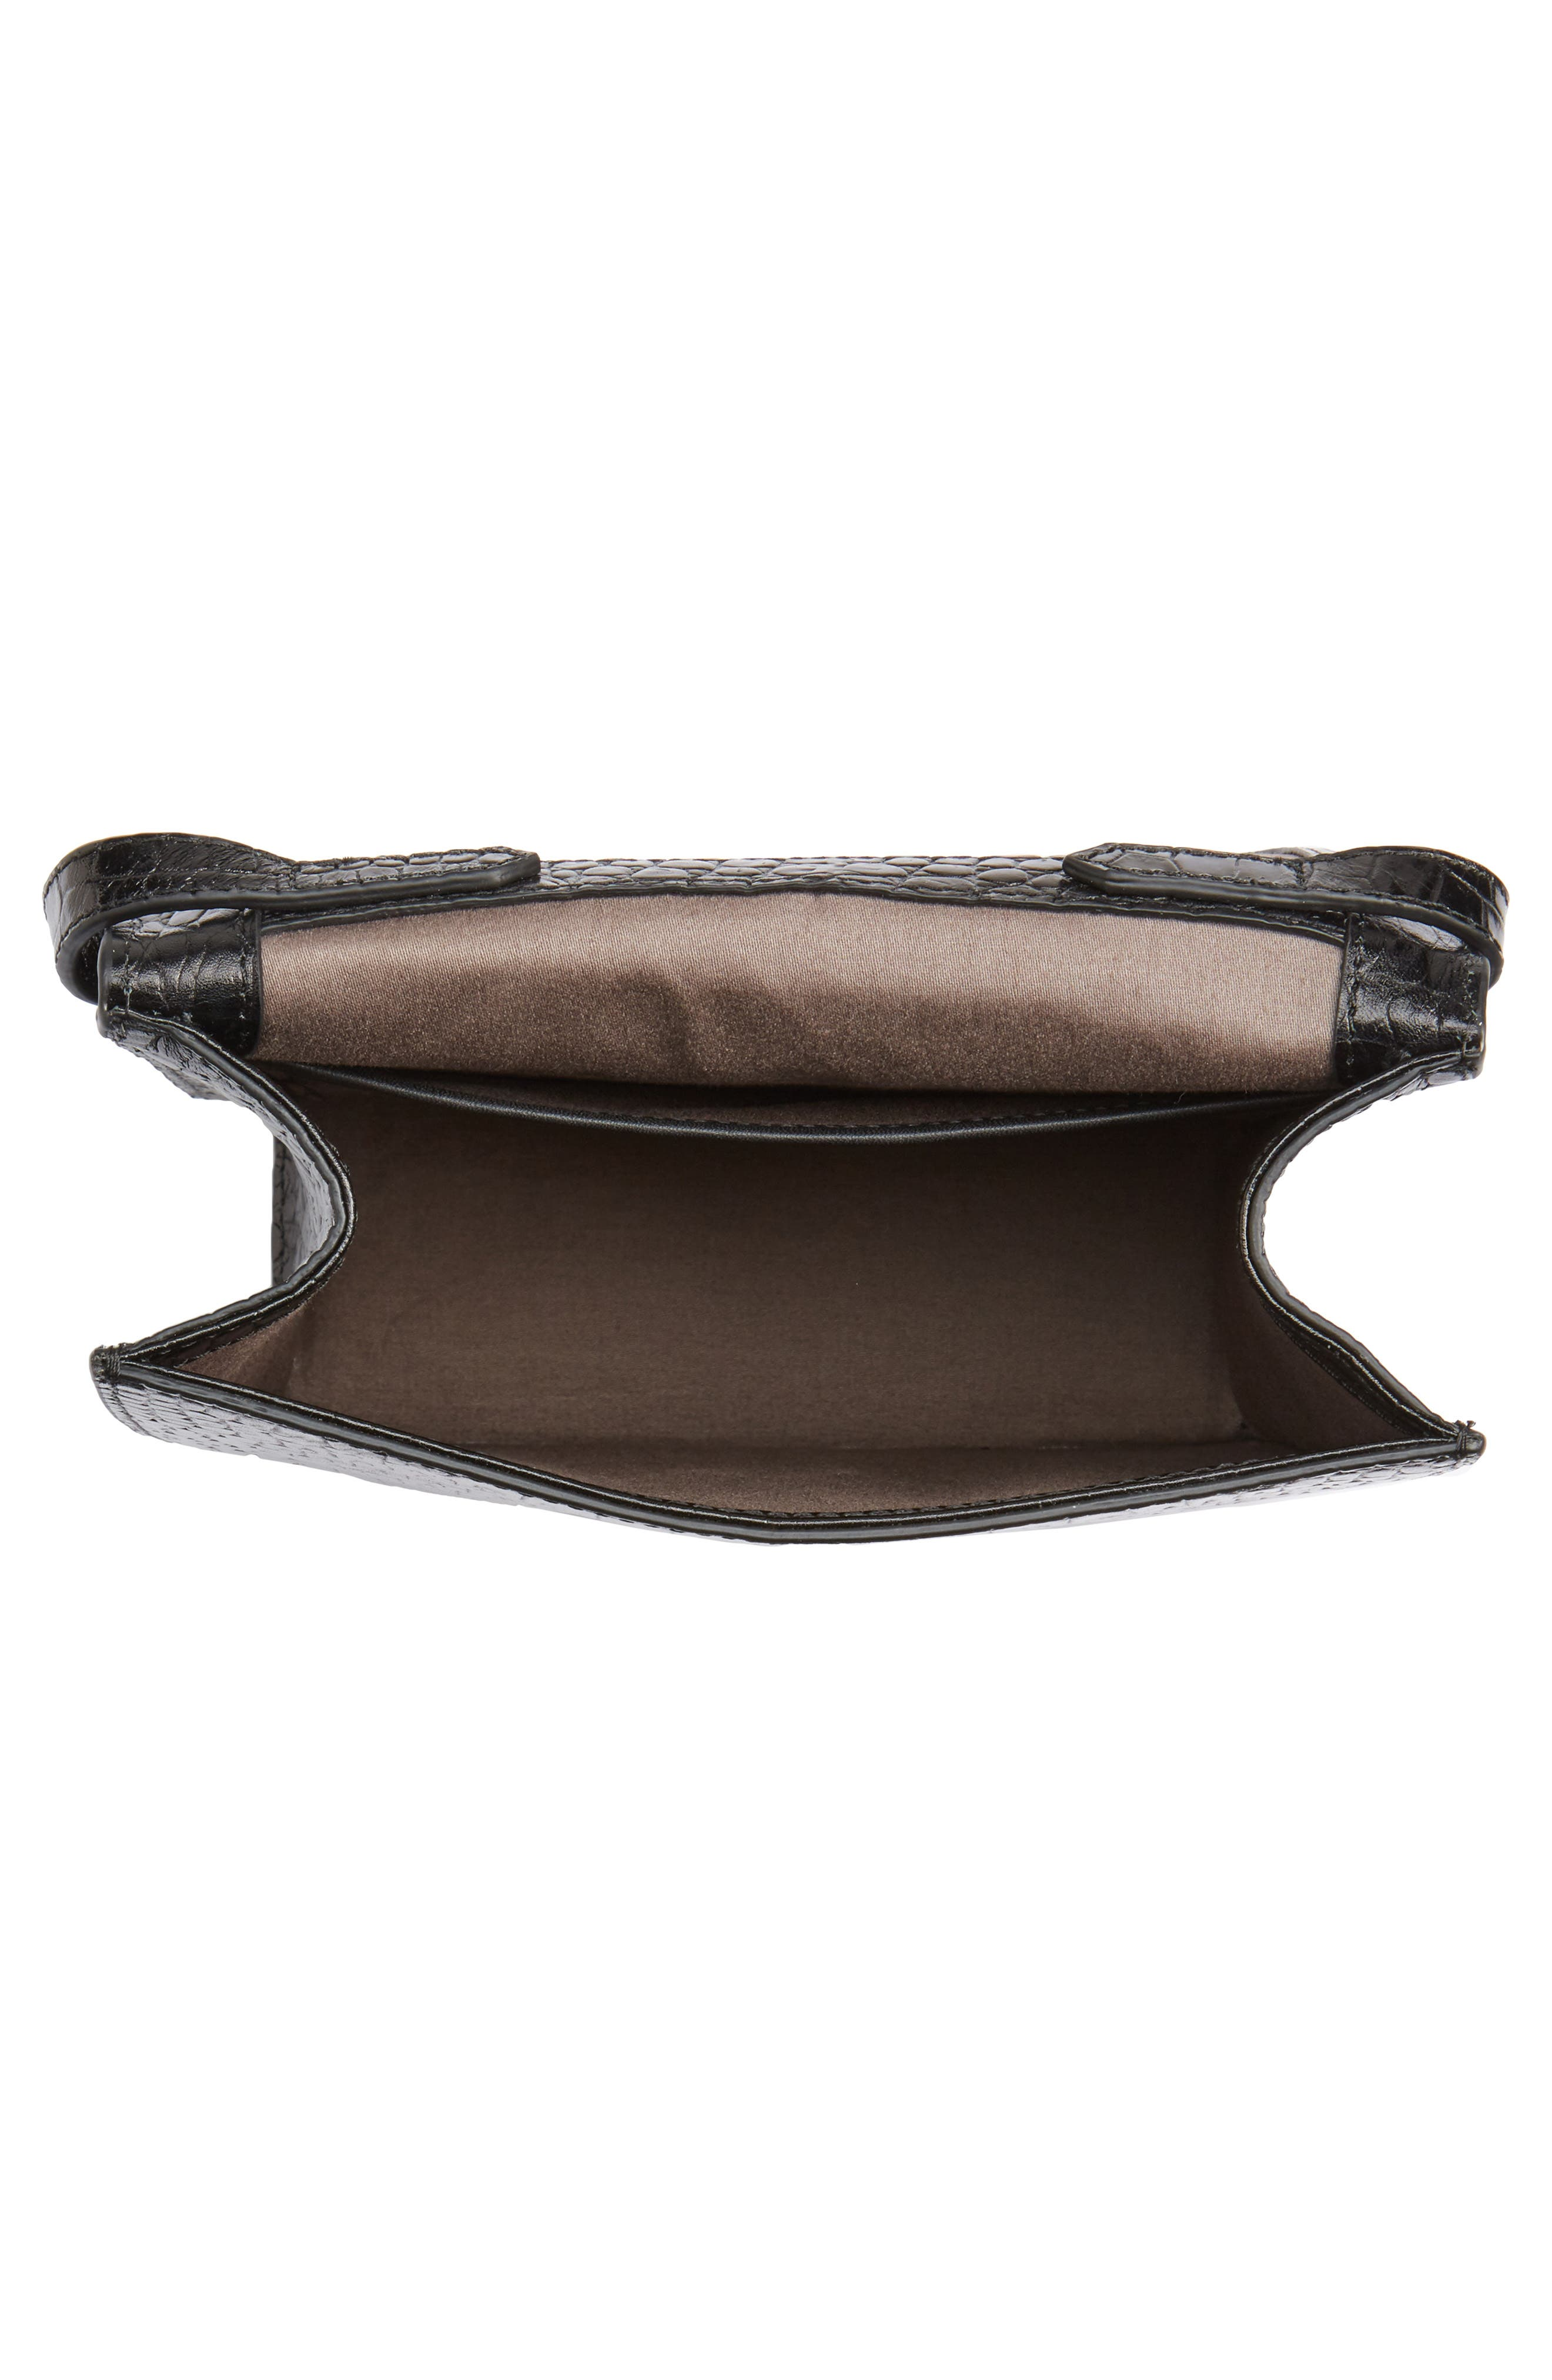 Eloise Leather Crossbody Bag,                             Alternate thumbnail 4, color,                             Black